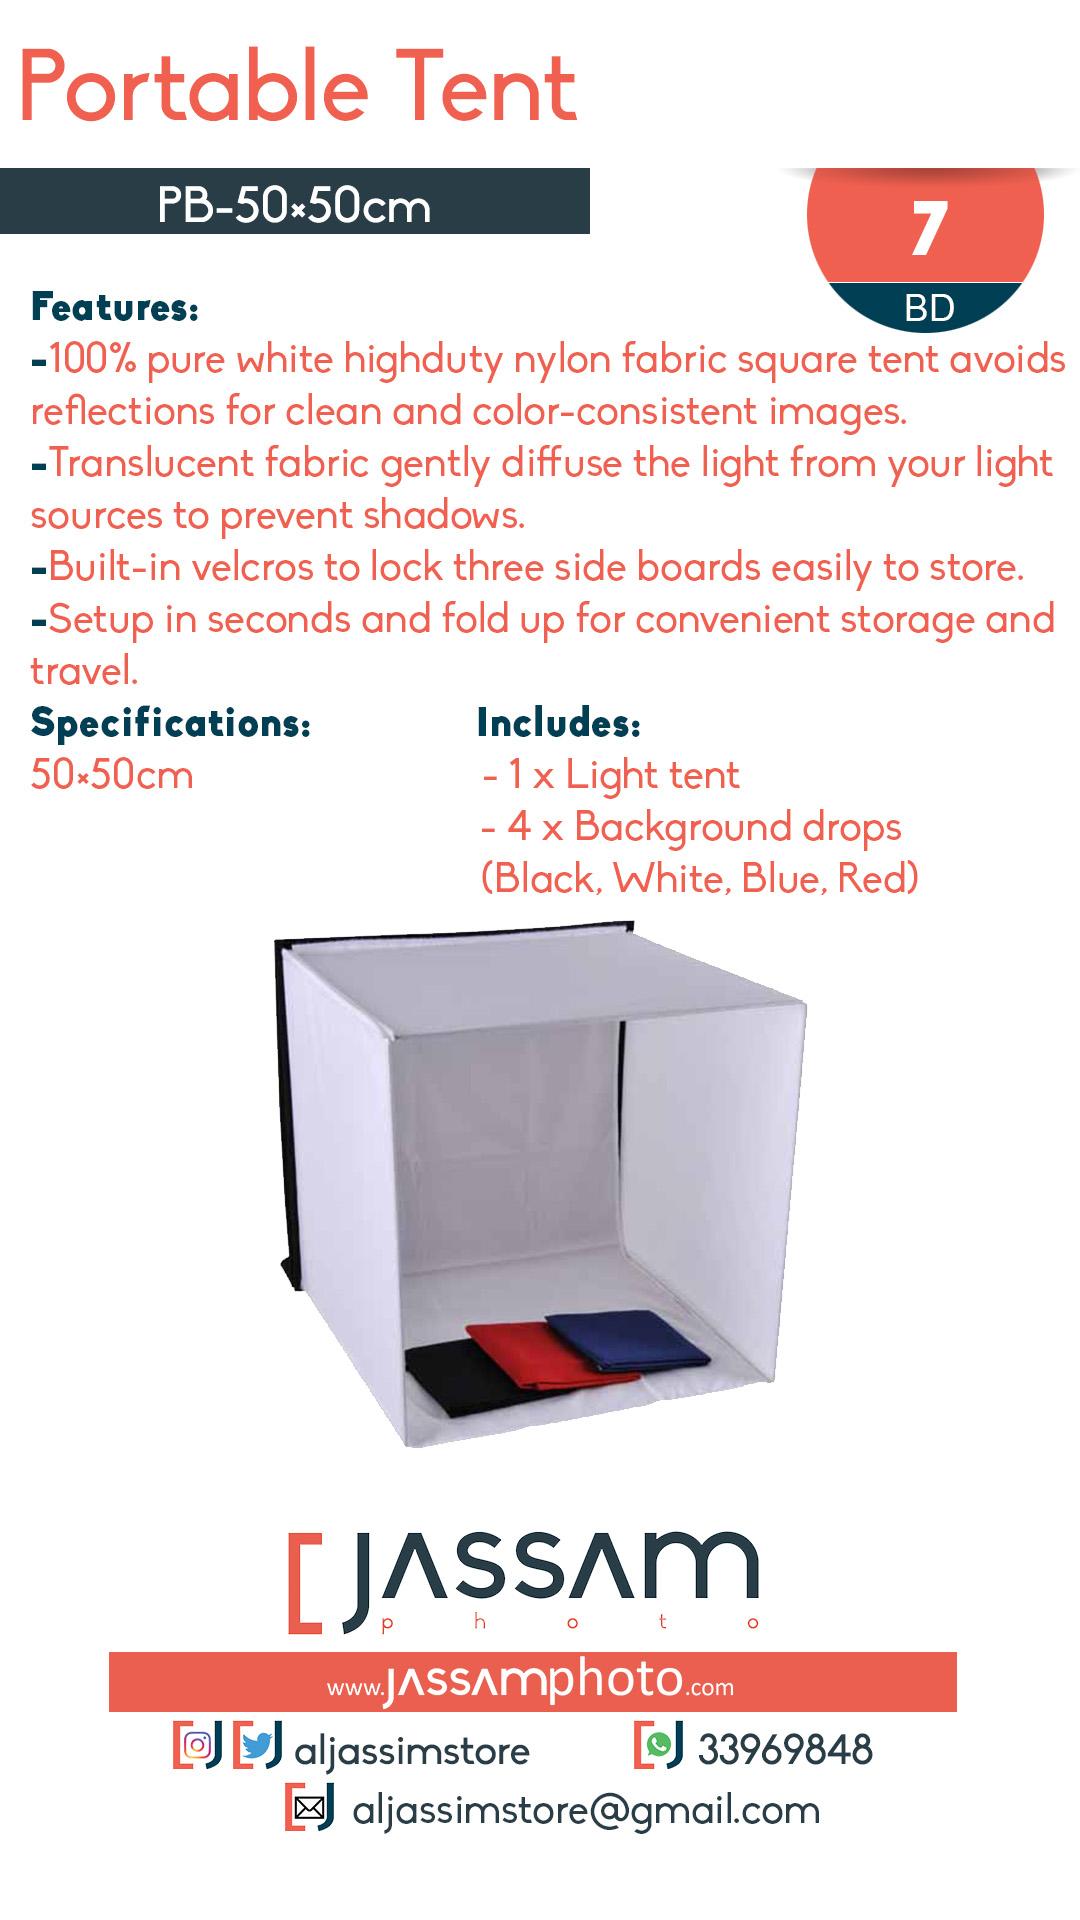 Portable Tent 50x50cm